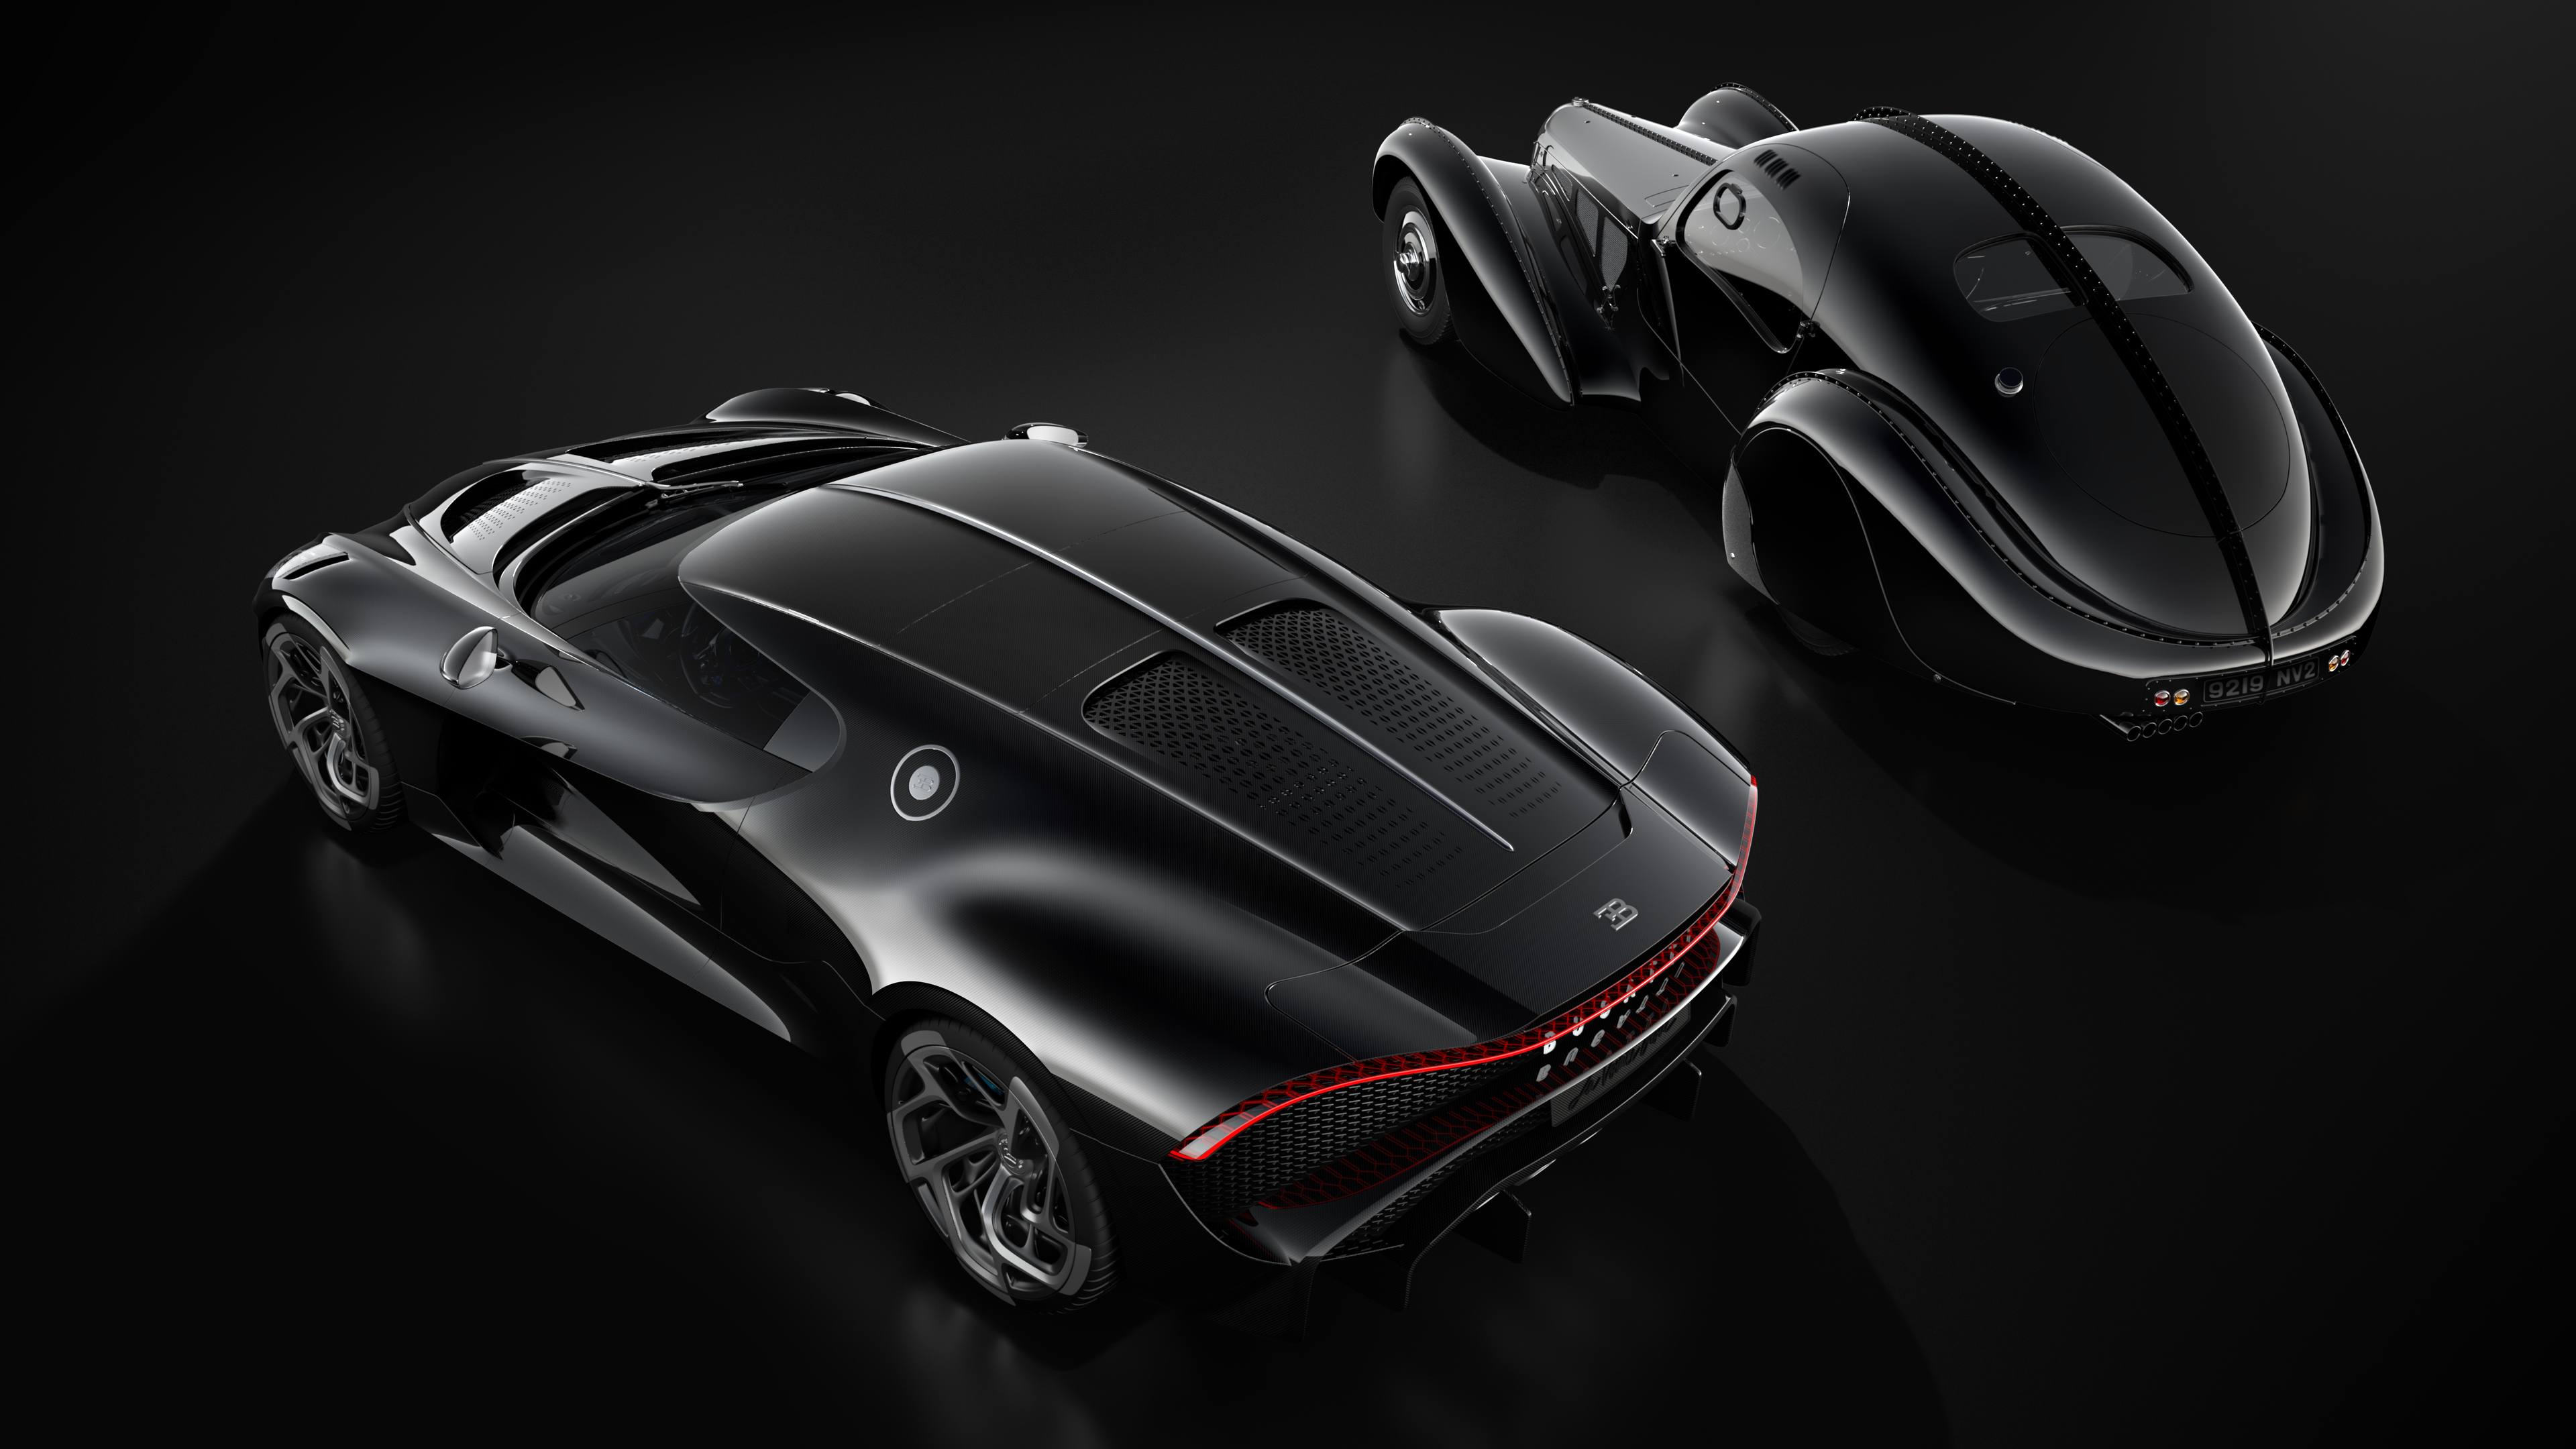 Wallpaper 4k Bugatti La Voiture Noire 2019 4k 2019 Cars